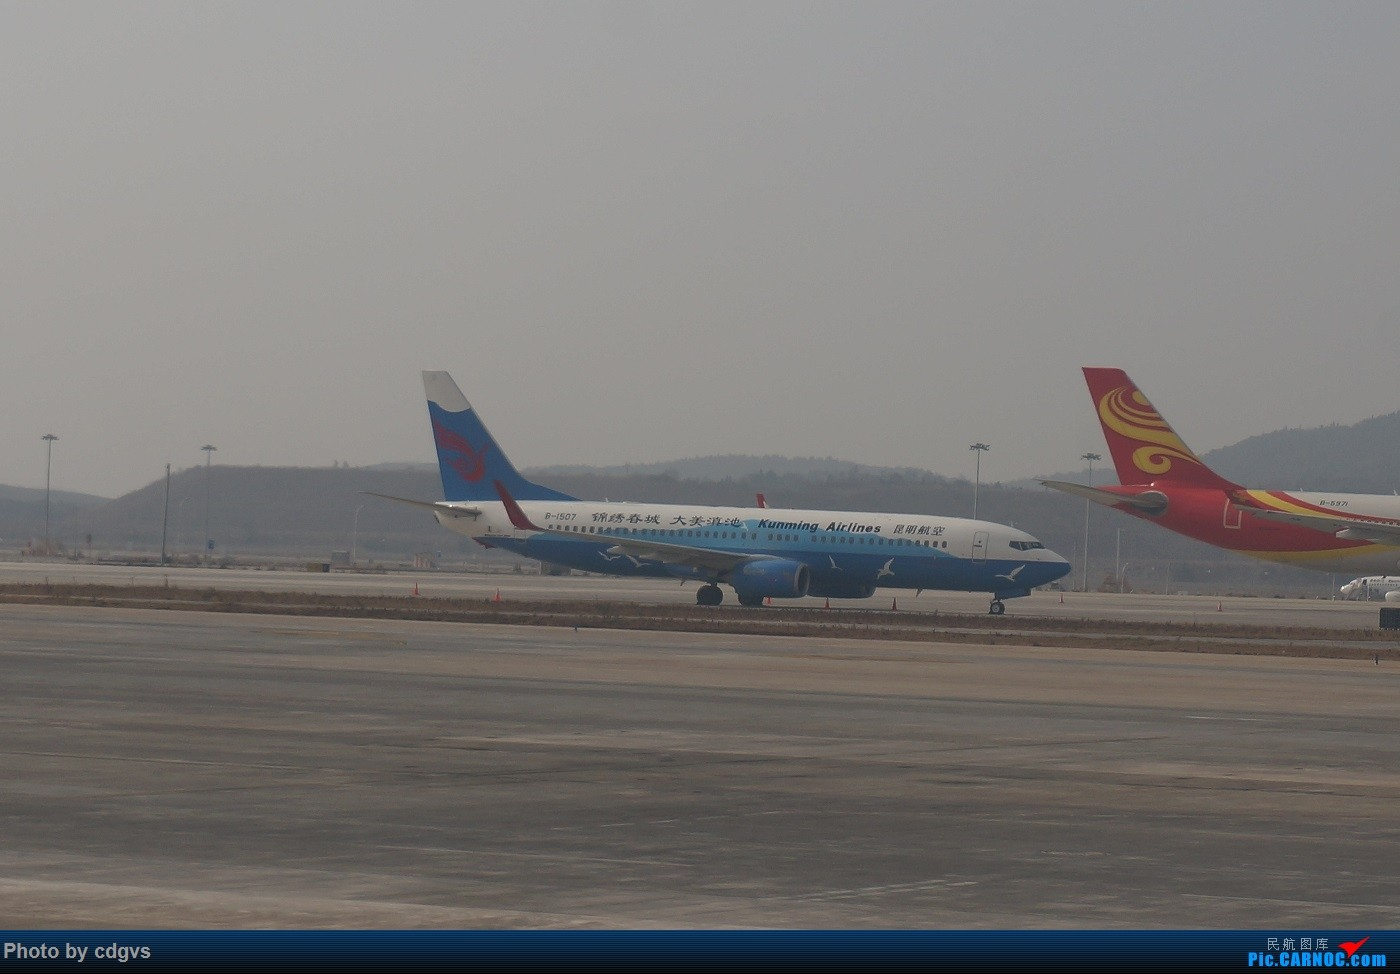 Re:[原创]KMG-LJG-KMG 东航&南航 省内刷航段,飞空客波音两种不同机型 BOEING 737-800 B-1507 中国昆明长水国际机场